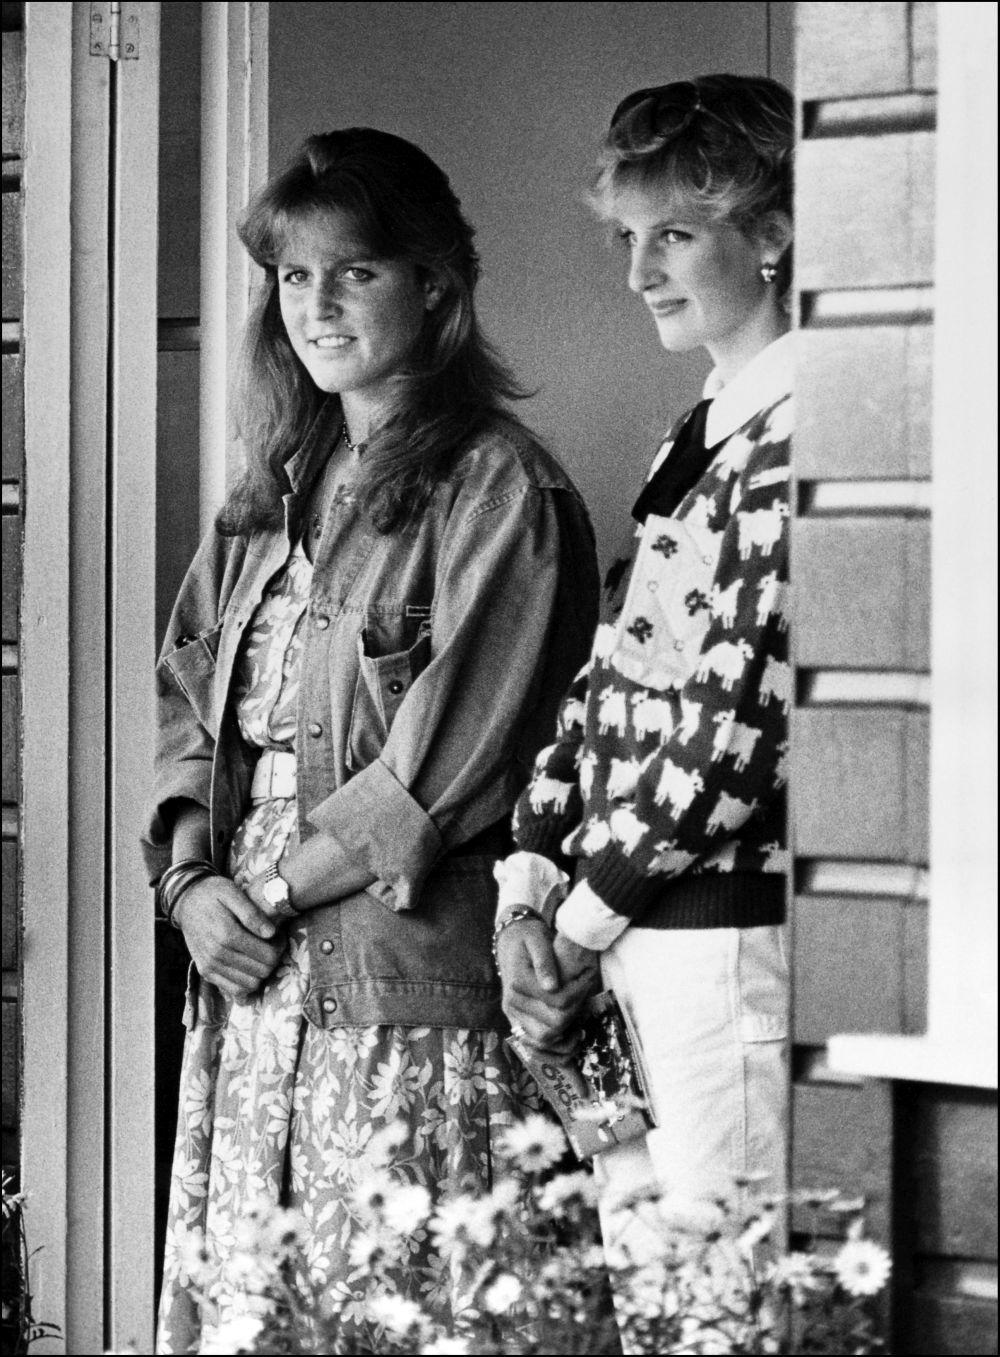 Sarah Herguson y Lady Di.